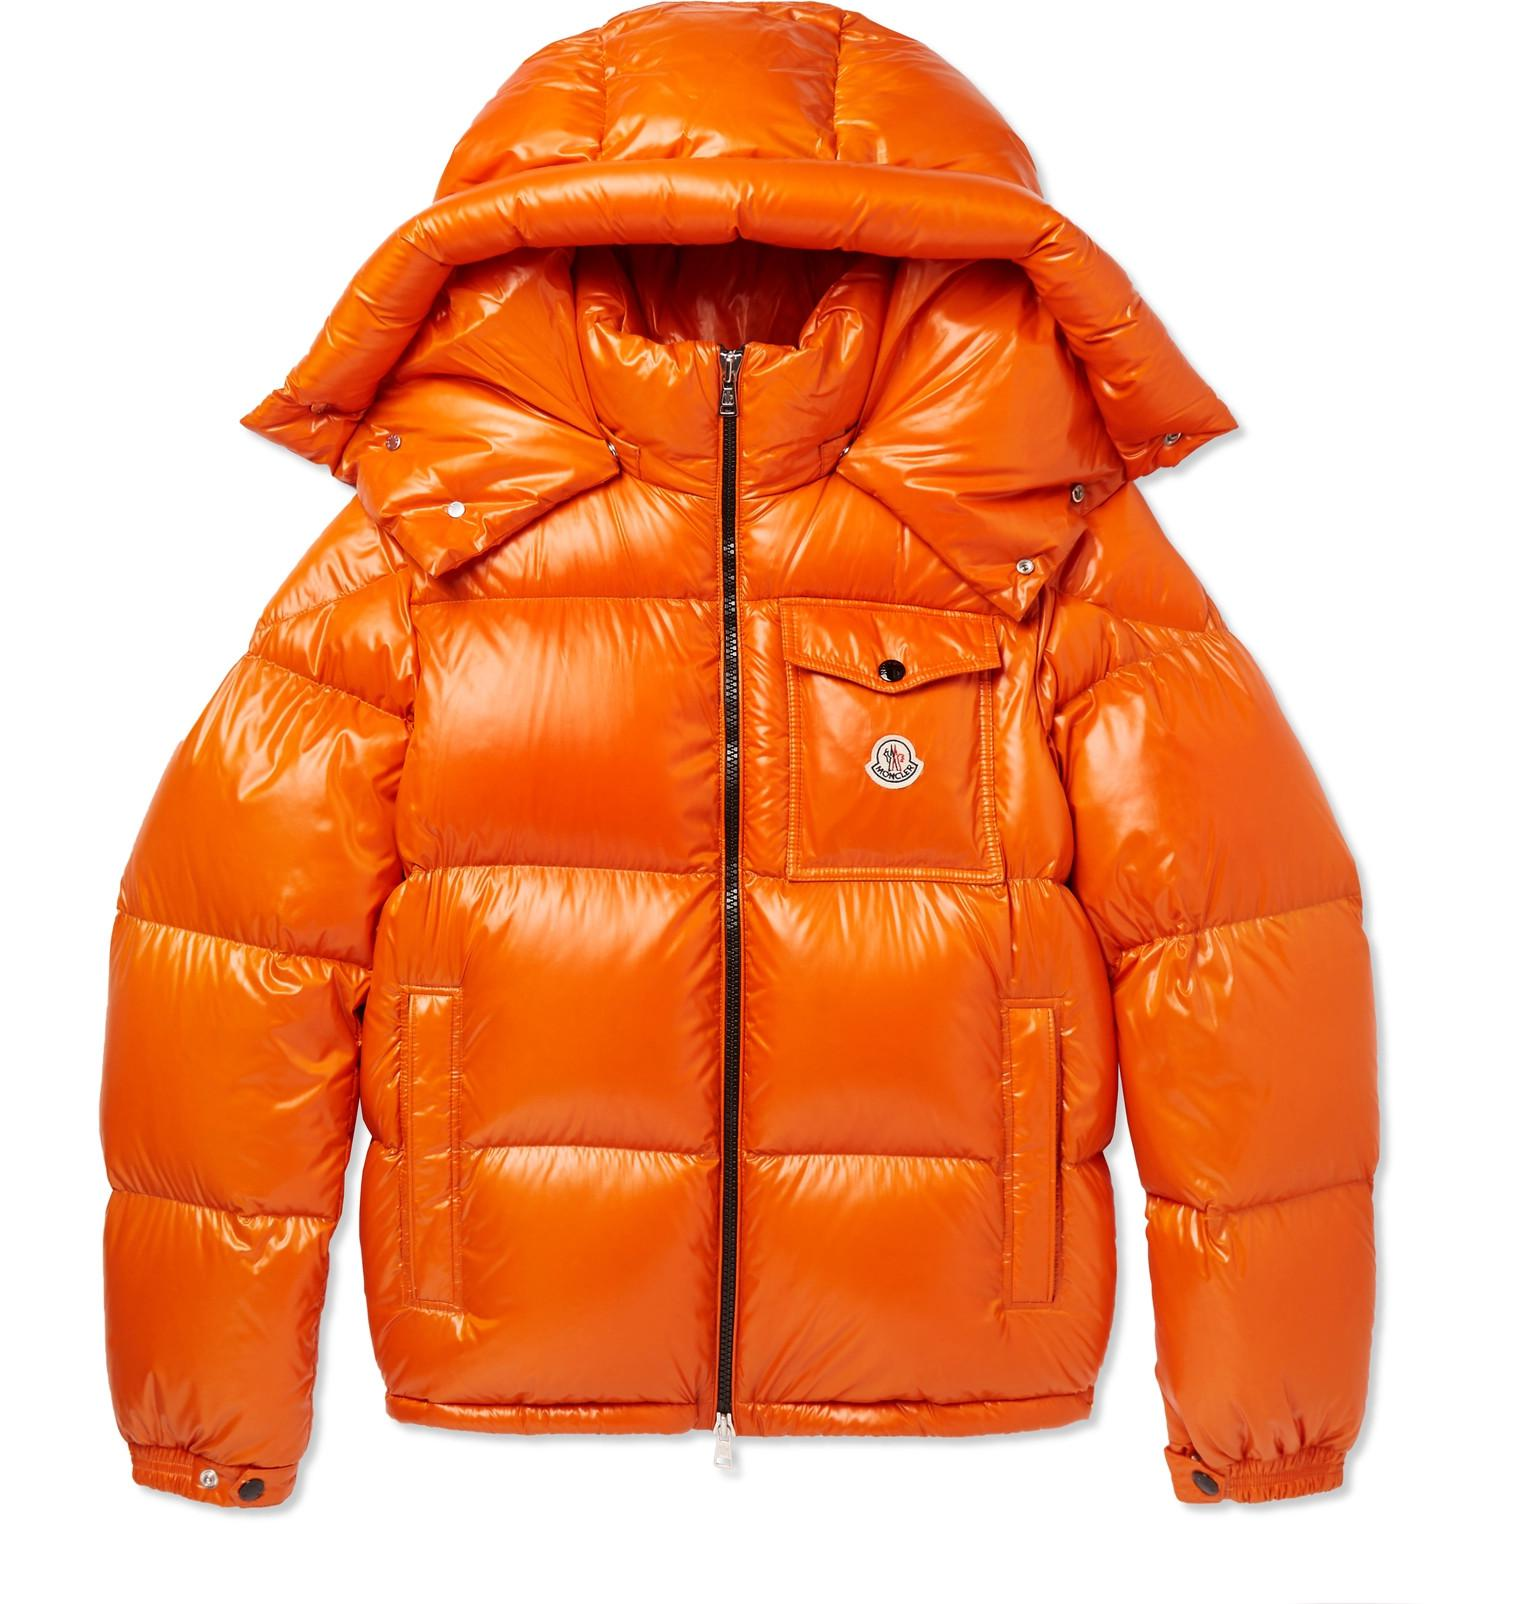 03260a447109 Moncler Montbeliard Nylon Laqué Down Jacket in Orange for Men - Lyst